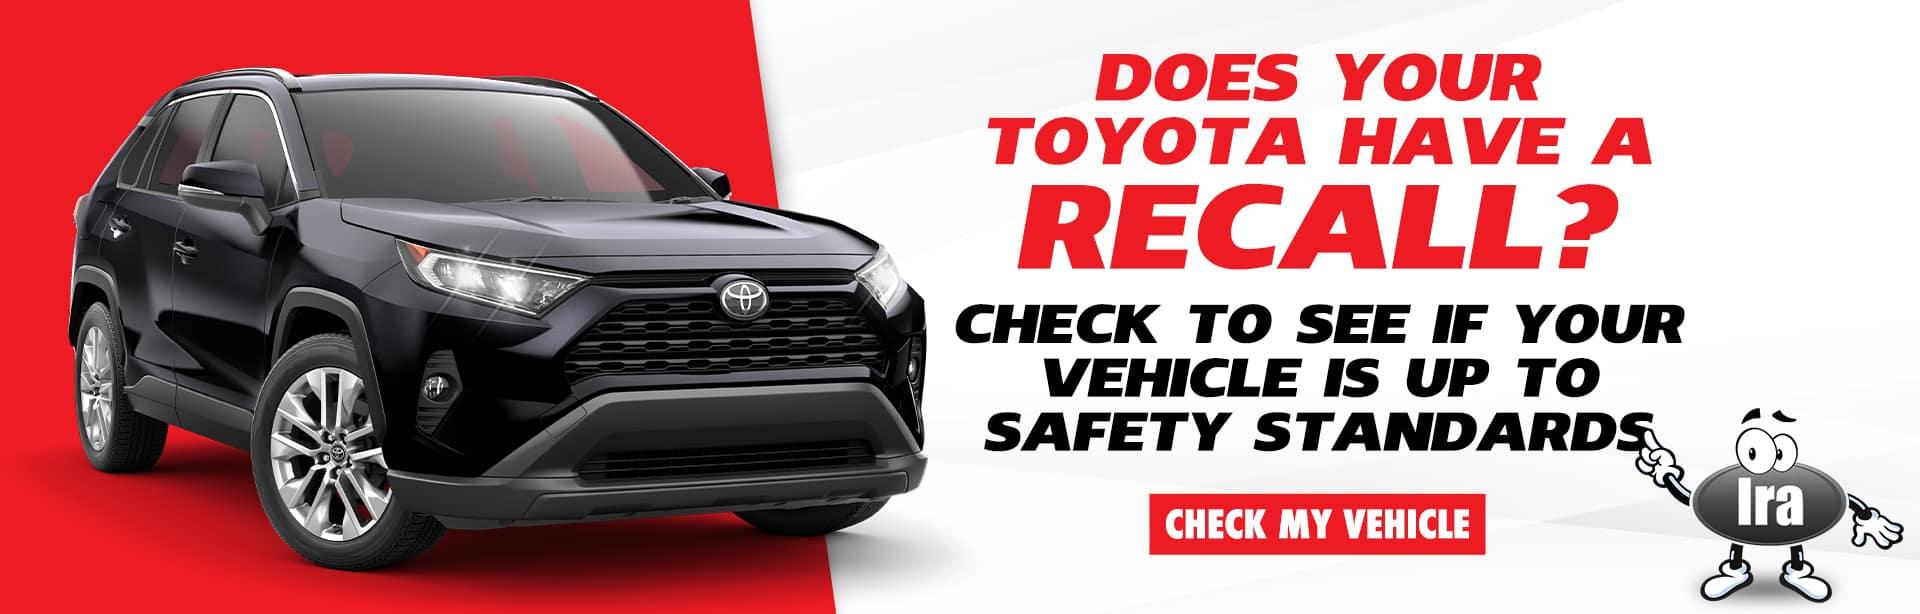 ToyotaManchester_Recall_Slide_1920x614_04-2020